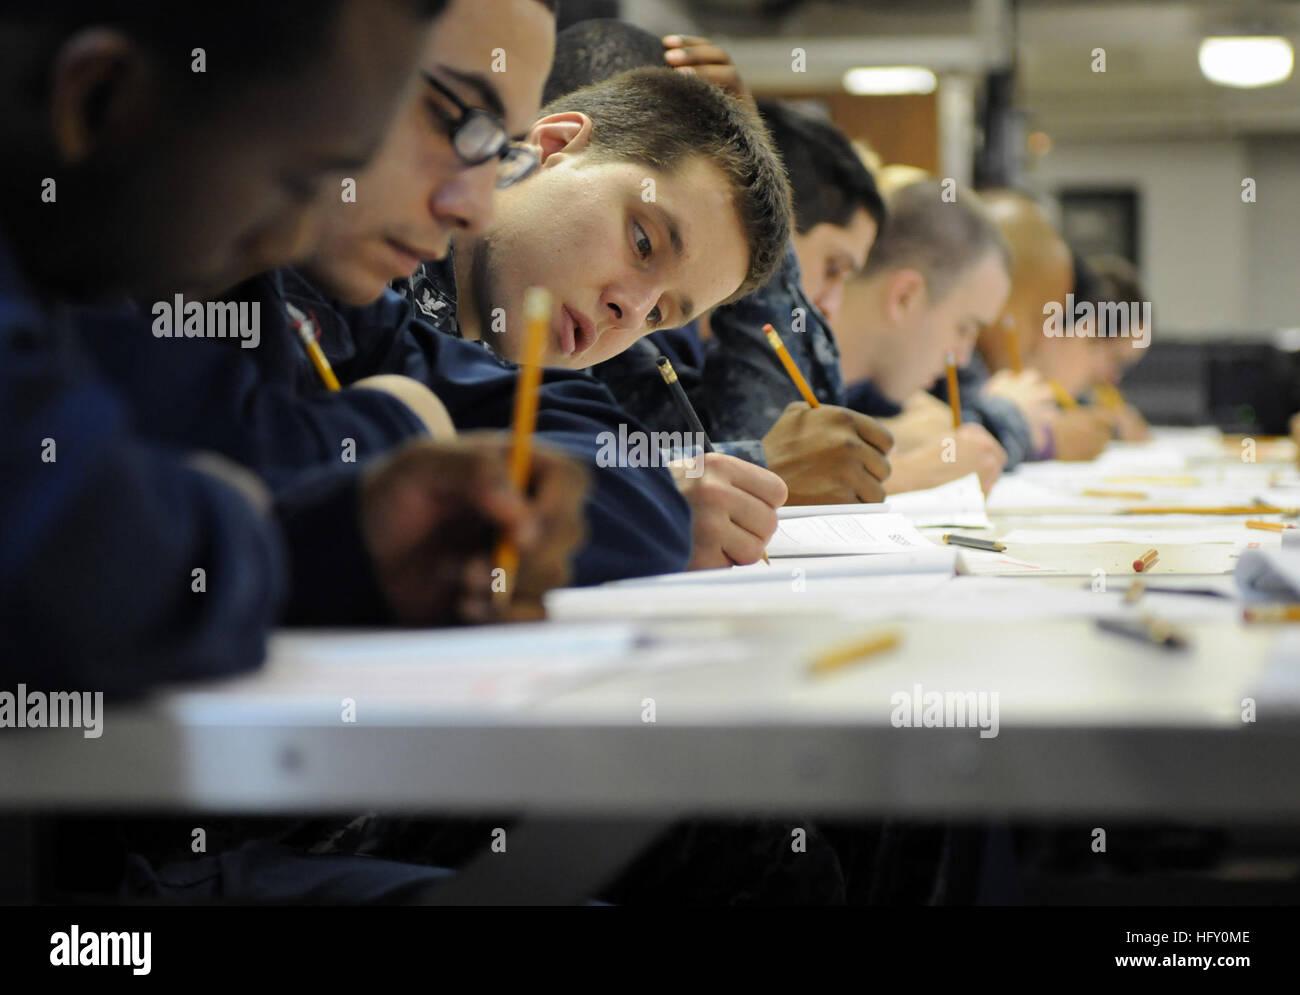 110310-N-6505H-049 ARABIAN SEA (March 10, 2011) Operations Specialist 3rd Class Patrick L. Palkowski participates - Stock Image